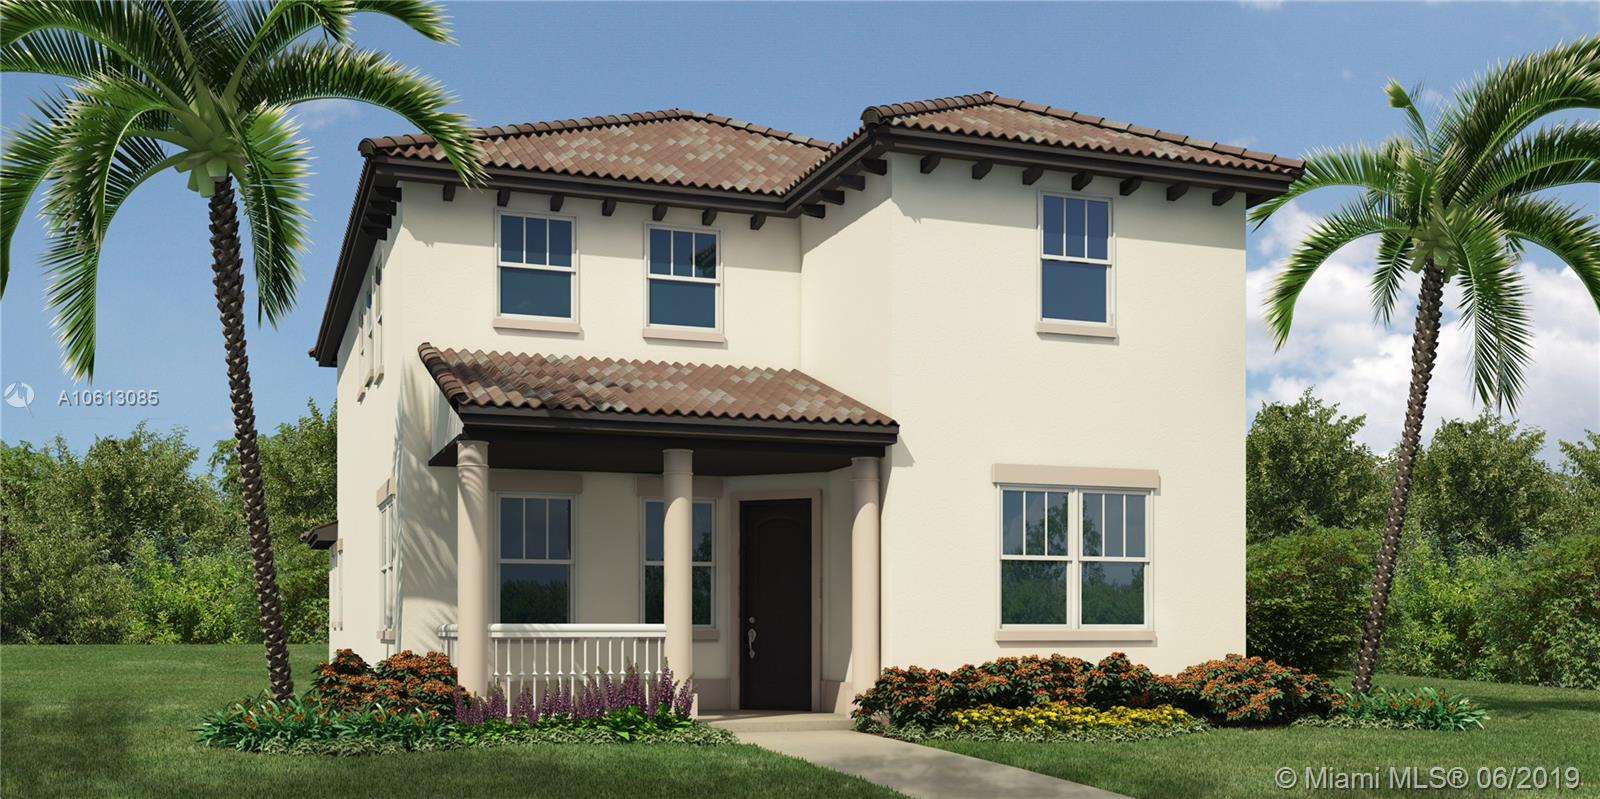 24443 SW 118 Avenue Property Photo